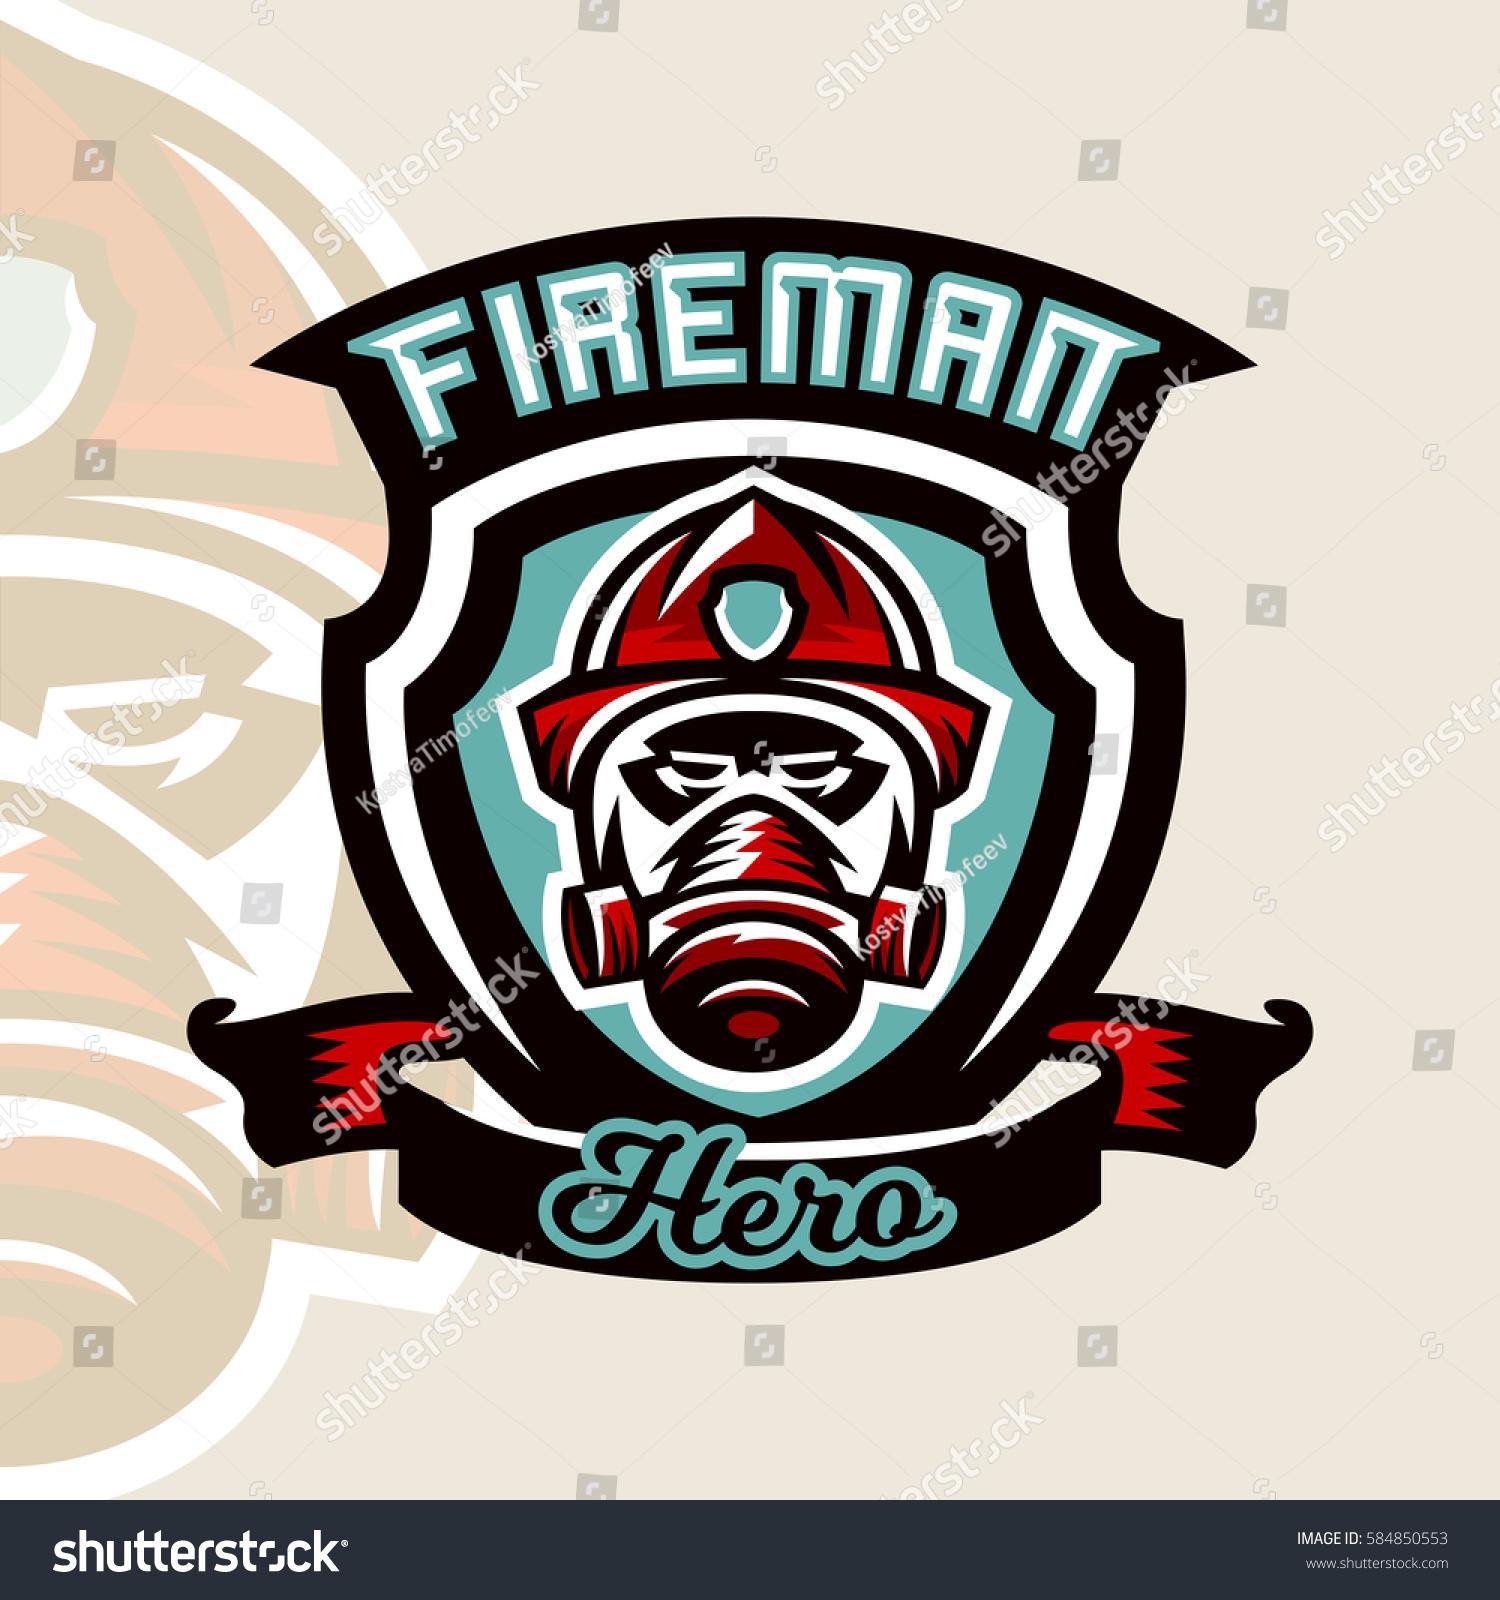 illustrator tutorial logo design  Flame icon logo tutorial  Fire Logo   Design School MC